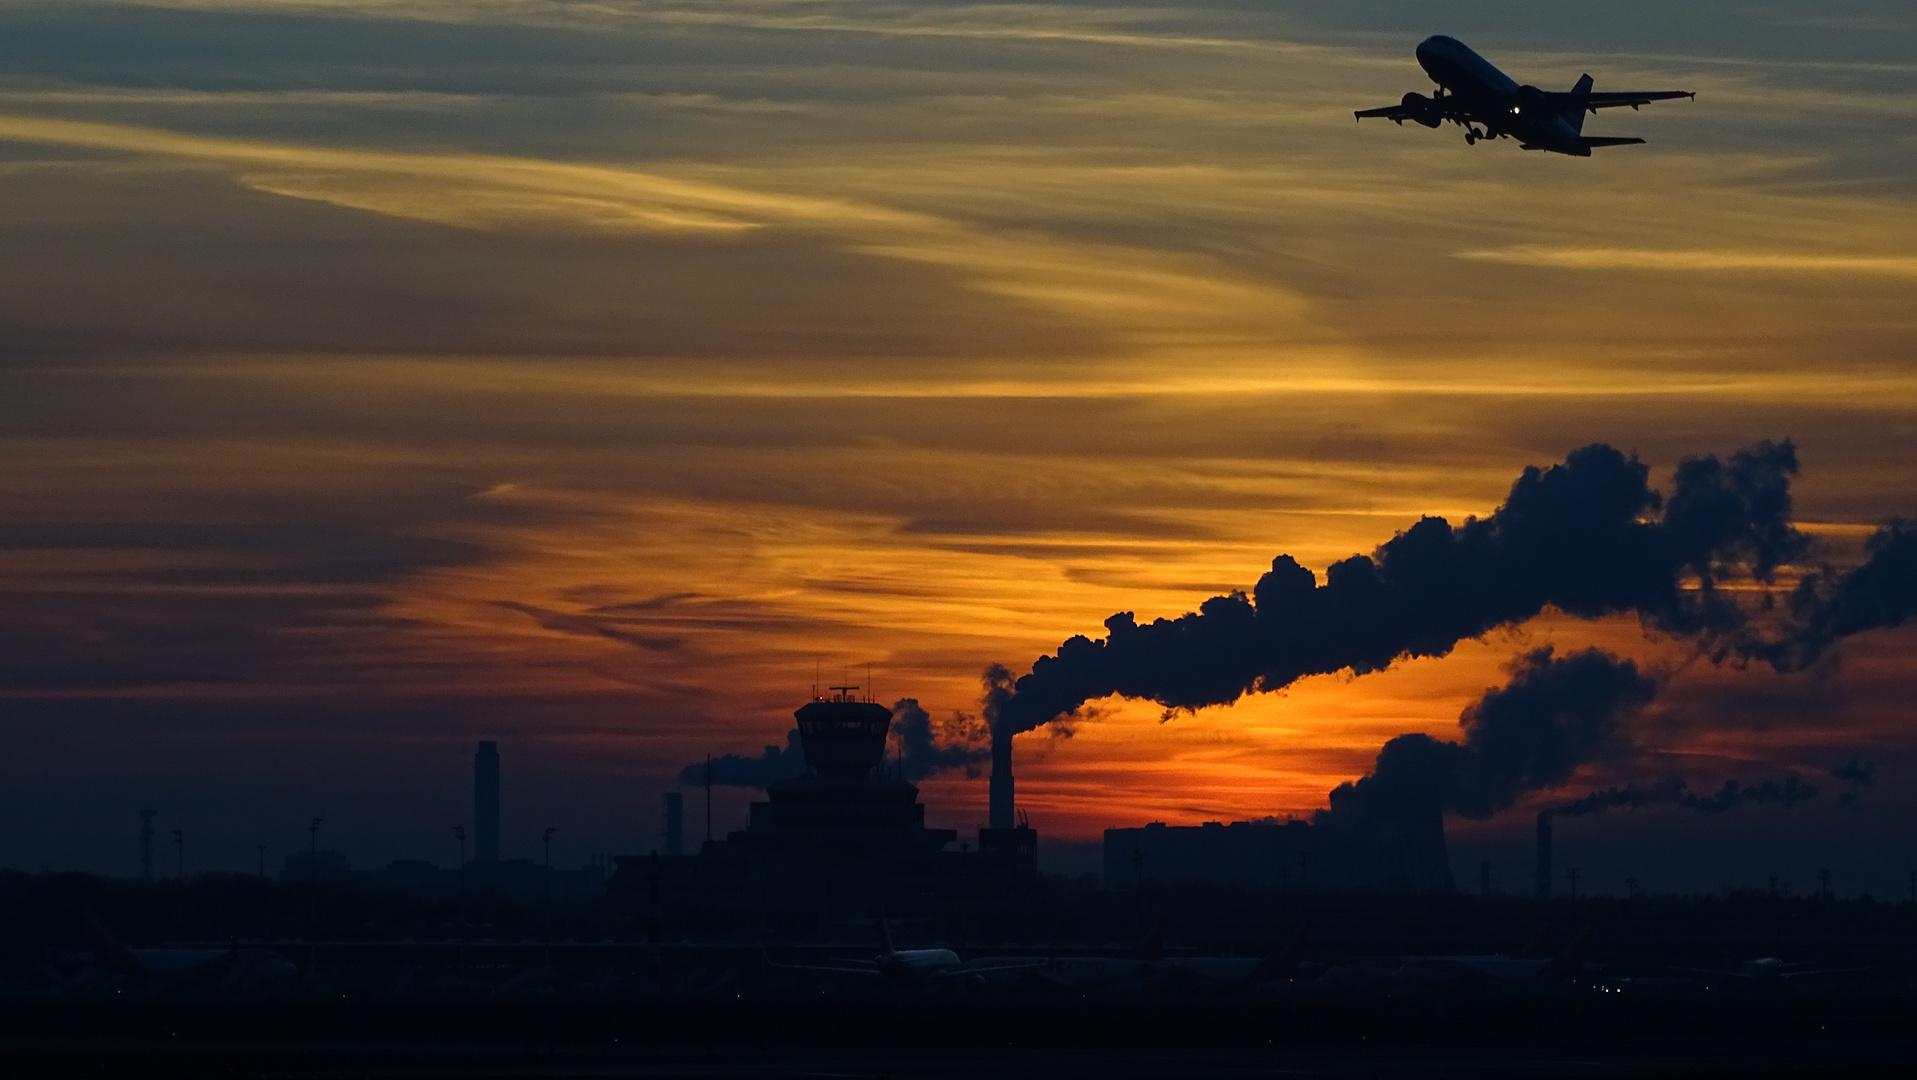 Sonnenuntergang auf dem Flughafen Berlin Tegel TXL